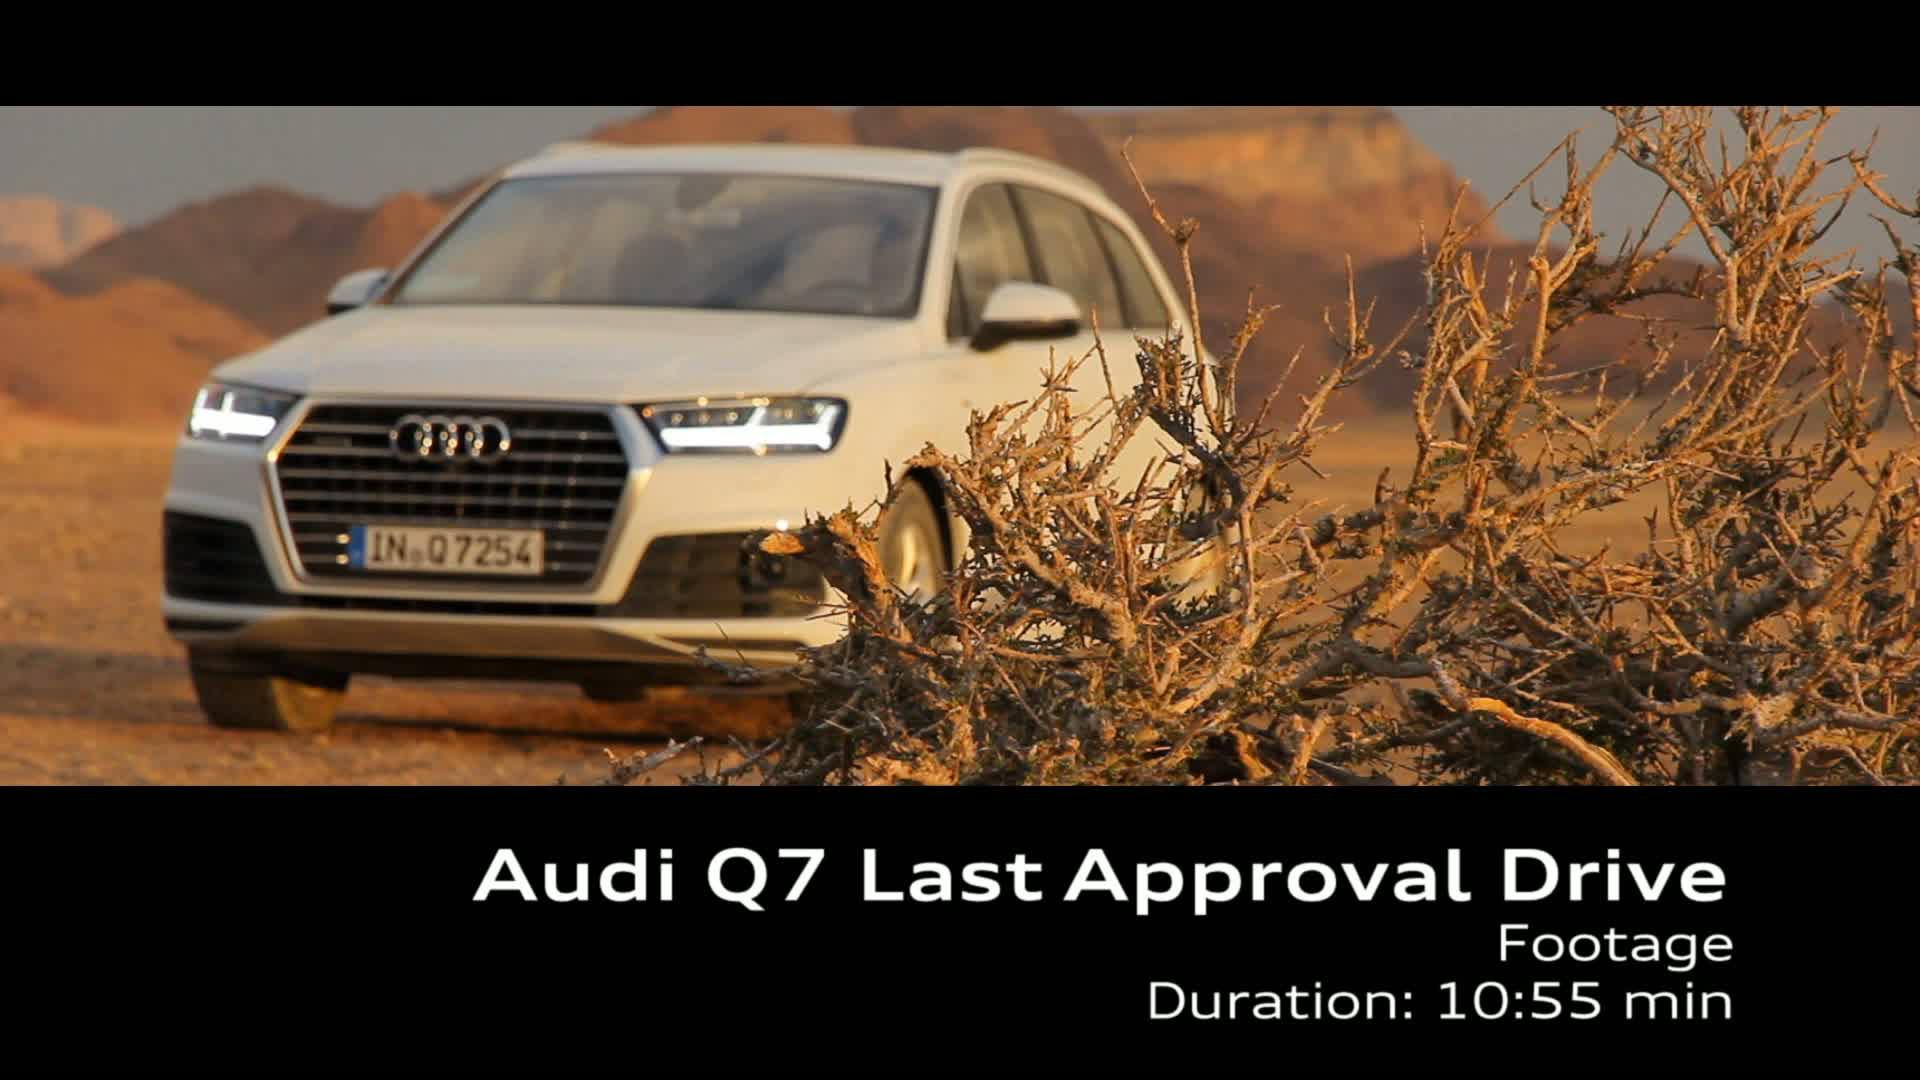 Last Approval Drive Audi Q7 - Footage